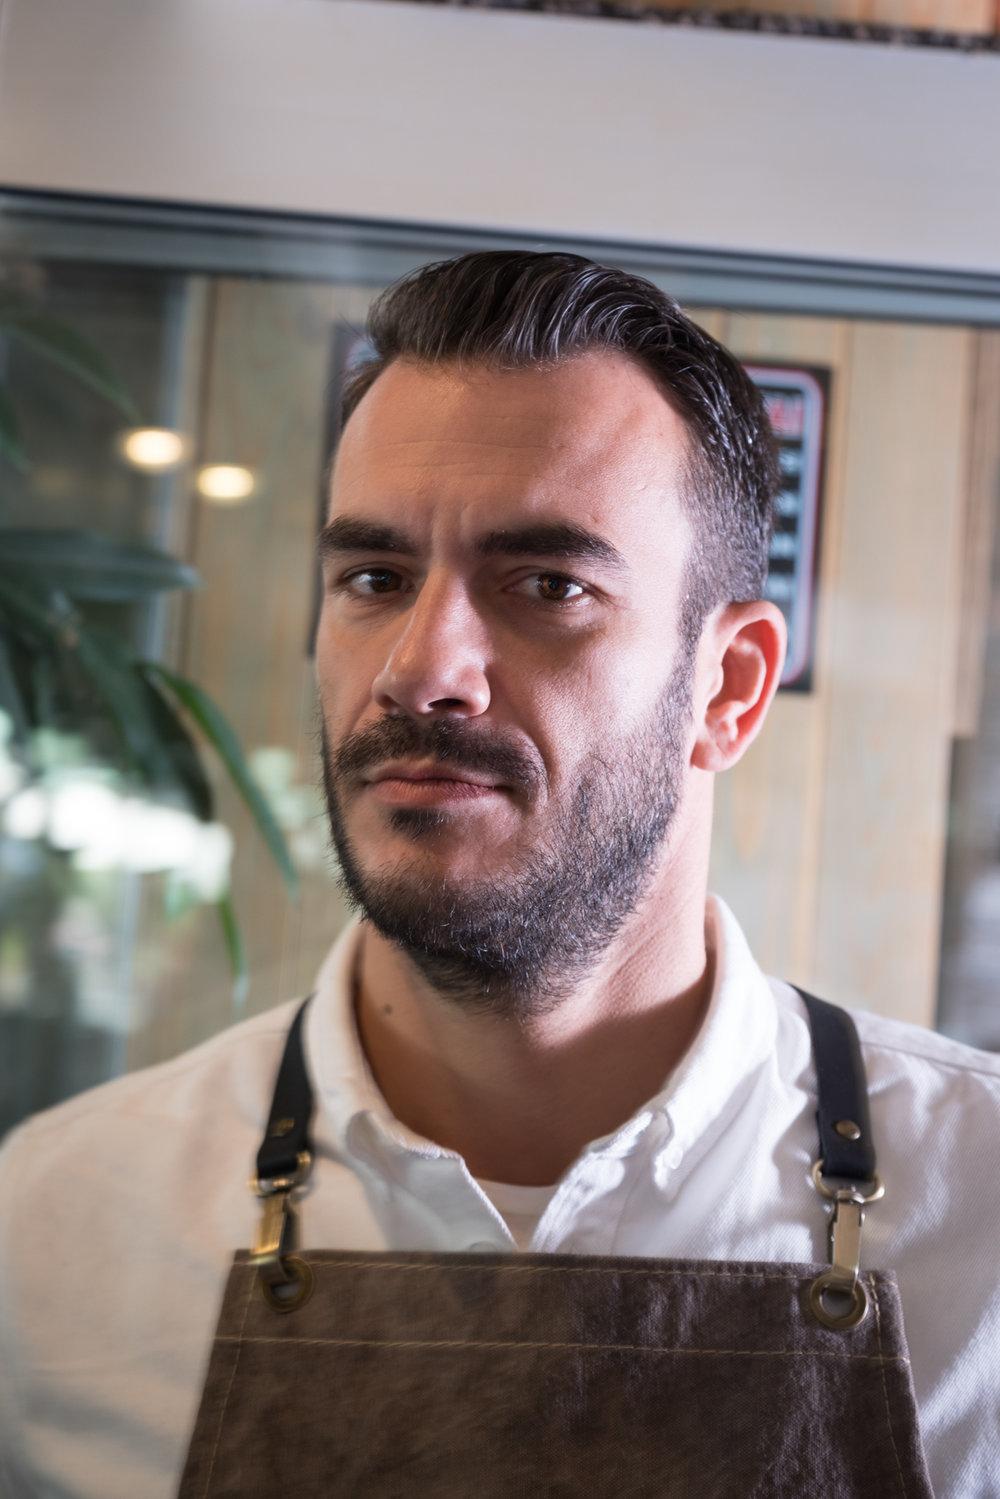 Stefanos Domatiotis - Ο Στέφανος Δωματιώτης είναι παγκόσμιος πρωταθλητής για το Πρωτάθλημα Brewers Cup 2014. Είναι πιστοποιημένος κριτής για το World Coffee Events (2015-2020), καθώς επίσης και πιστοποιημένος εκπαιδευτής από τη SCA 2014-2021 (AST). Member of SCA Chapter Event Coordinator 2016-2018 Έχει Εκπροσωπείση την Ελλάδα σε παγκόσμια πρωτάθλημα καφέ 12 φορές 6 φορες finalist WCE . Εχει βραβευτεί για την συμμετοχή του και έχει αναγνωριστεί ως μέλος του Best Coffee Nation στα Πρωταθλήματα WCE 2011, 2012, 2014. Είναι επαγγελματίας με πολύχρονη πείρα, από το 2008 έως σήμερα εργάζεται ως Barista Trainer για την εταιρεία Taf Coffee. Είναι συνεργάτης και μέλος της εταιρείας Ninety Plus Coffee, ως Maker από το 2014 έως 2018 Τέλος, είναι Master Trainer στο MasterJAS Barista CAMP στην Κίνα. Brand Ambassador B.